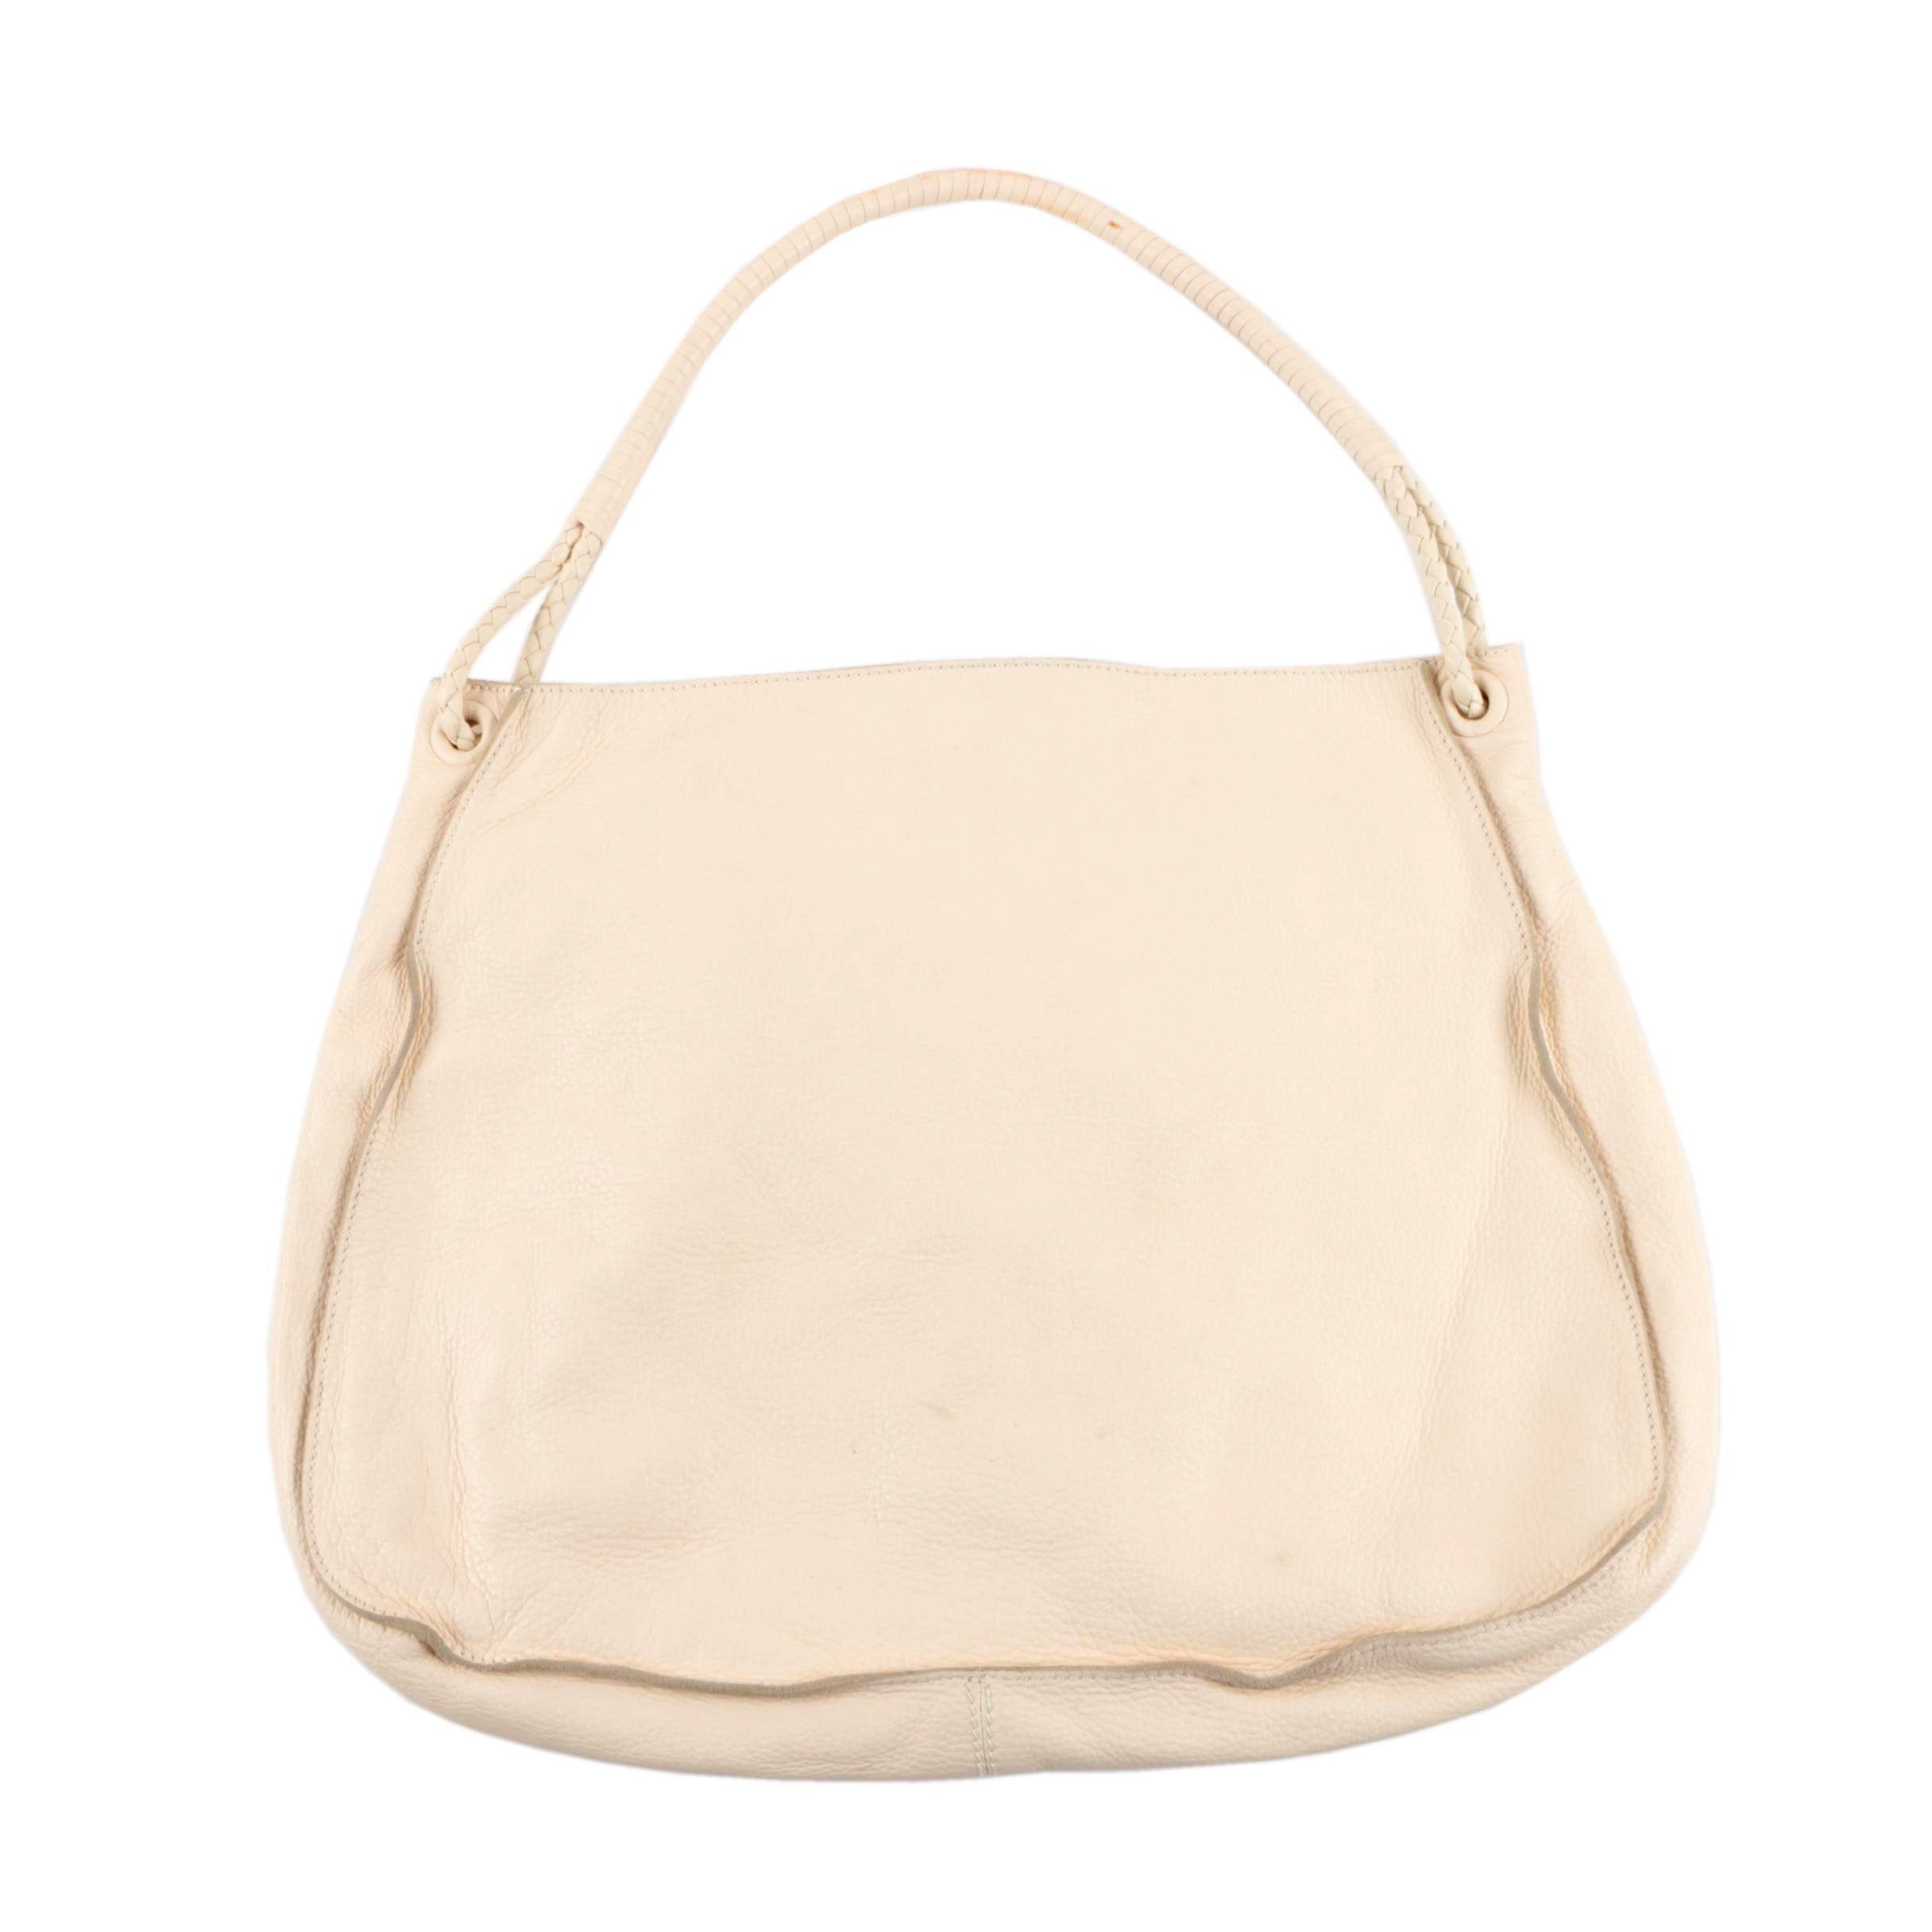 Bottega Veneta Grained Leather Handbag